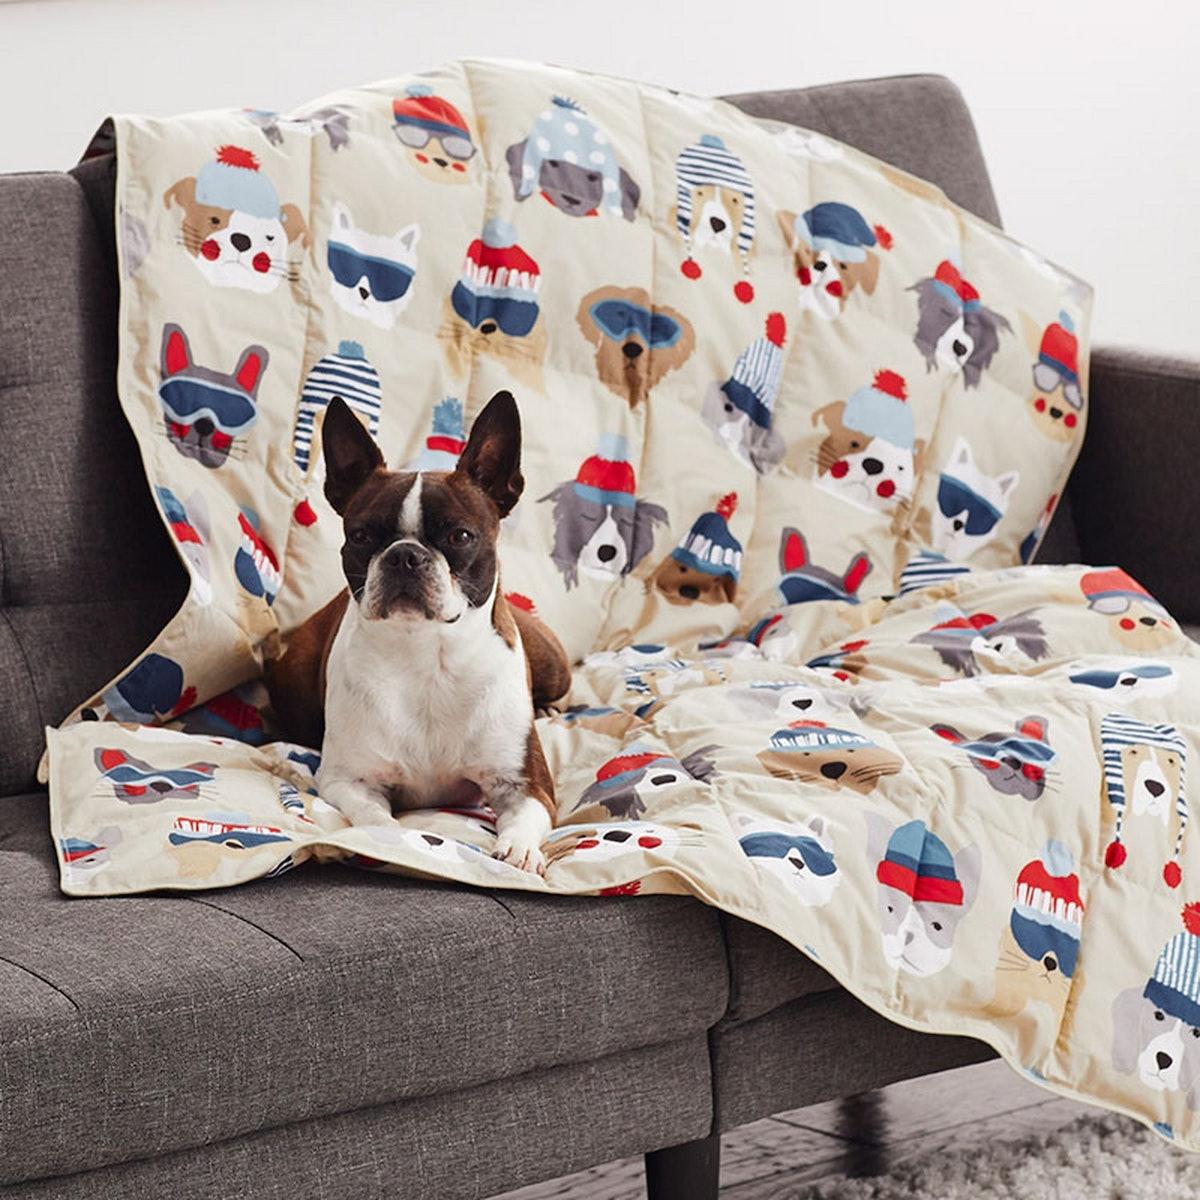 LoftAIRE Printed Dog Comforter